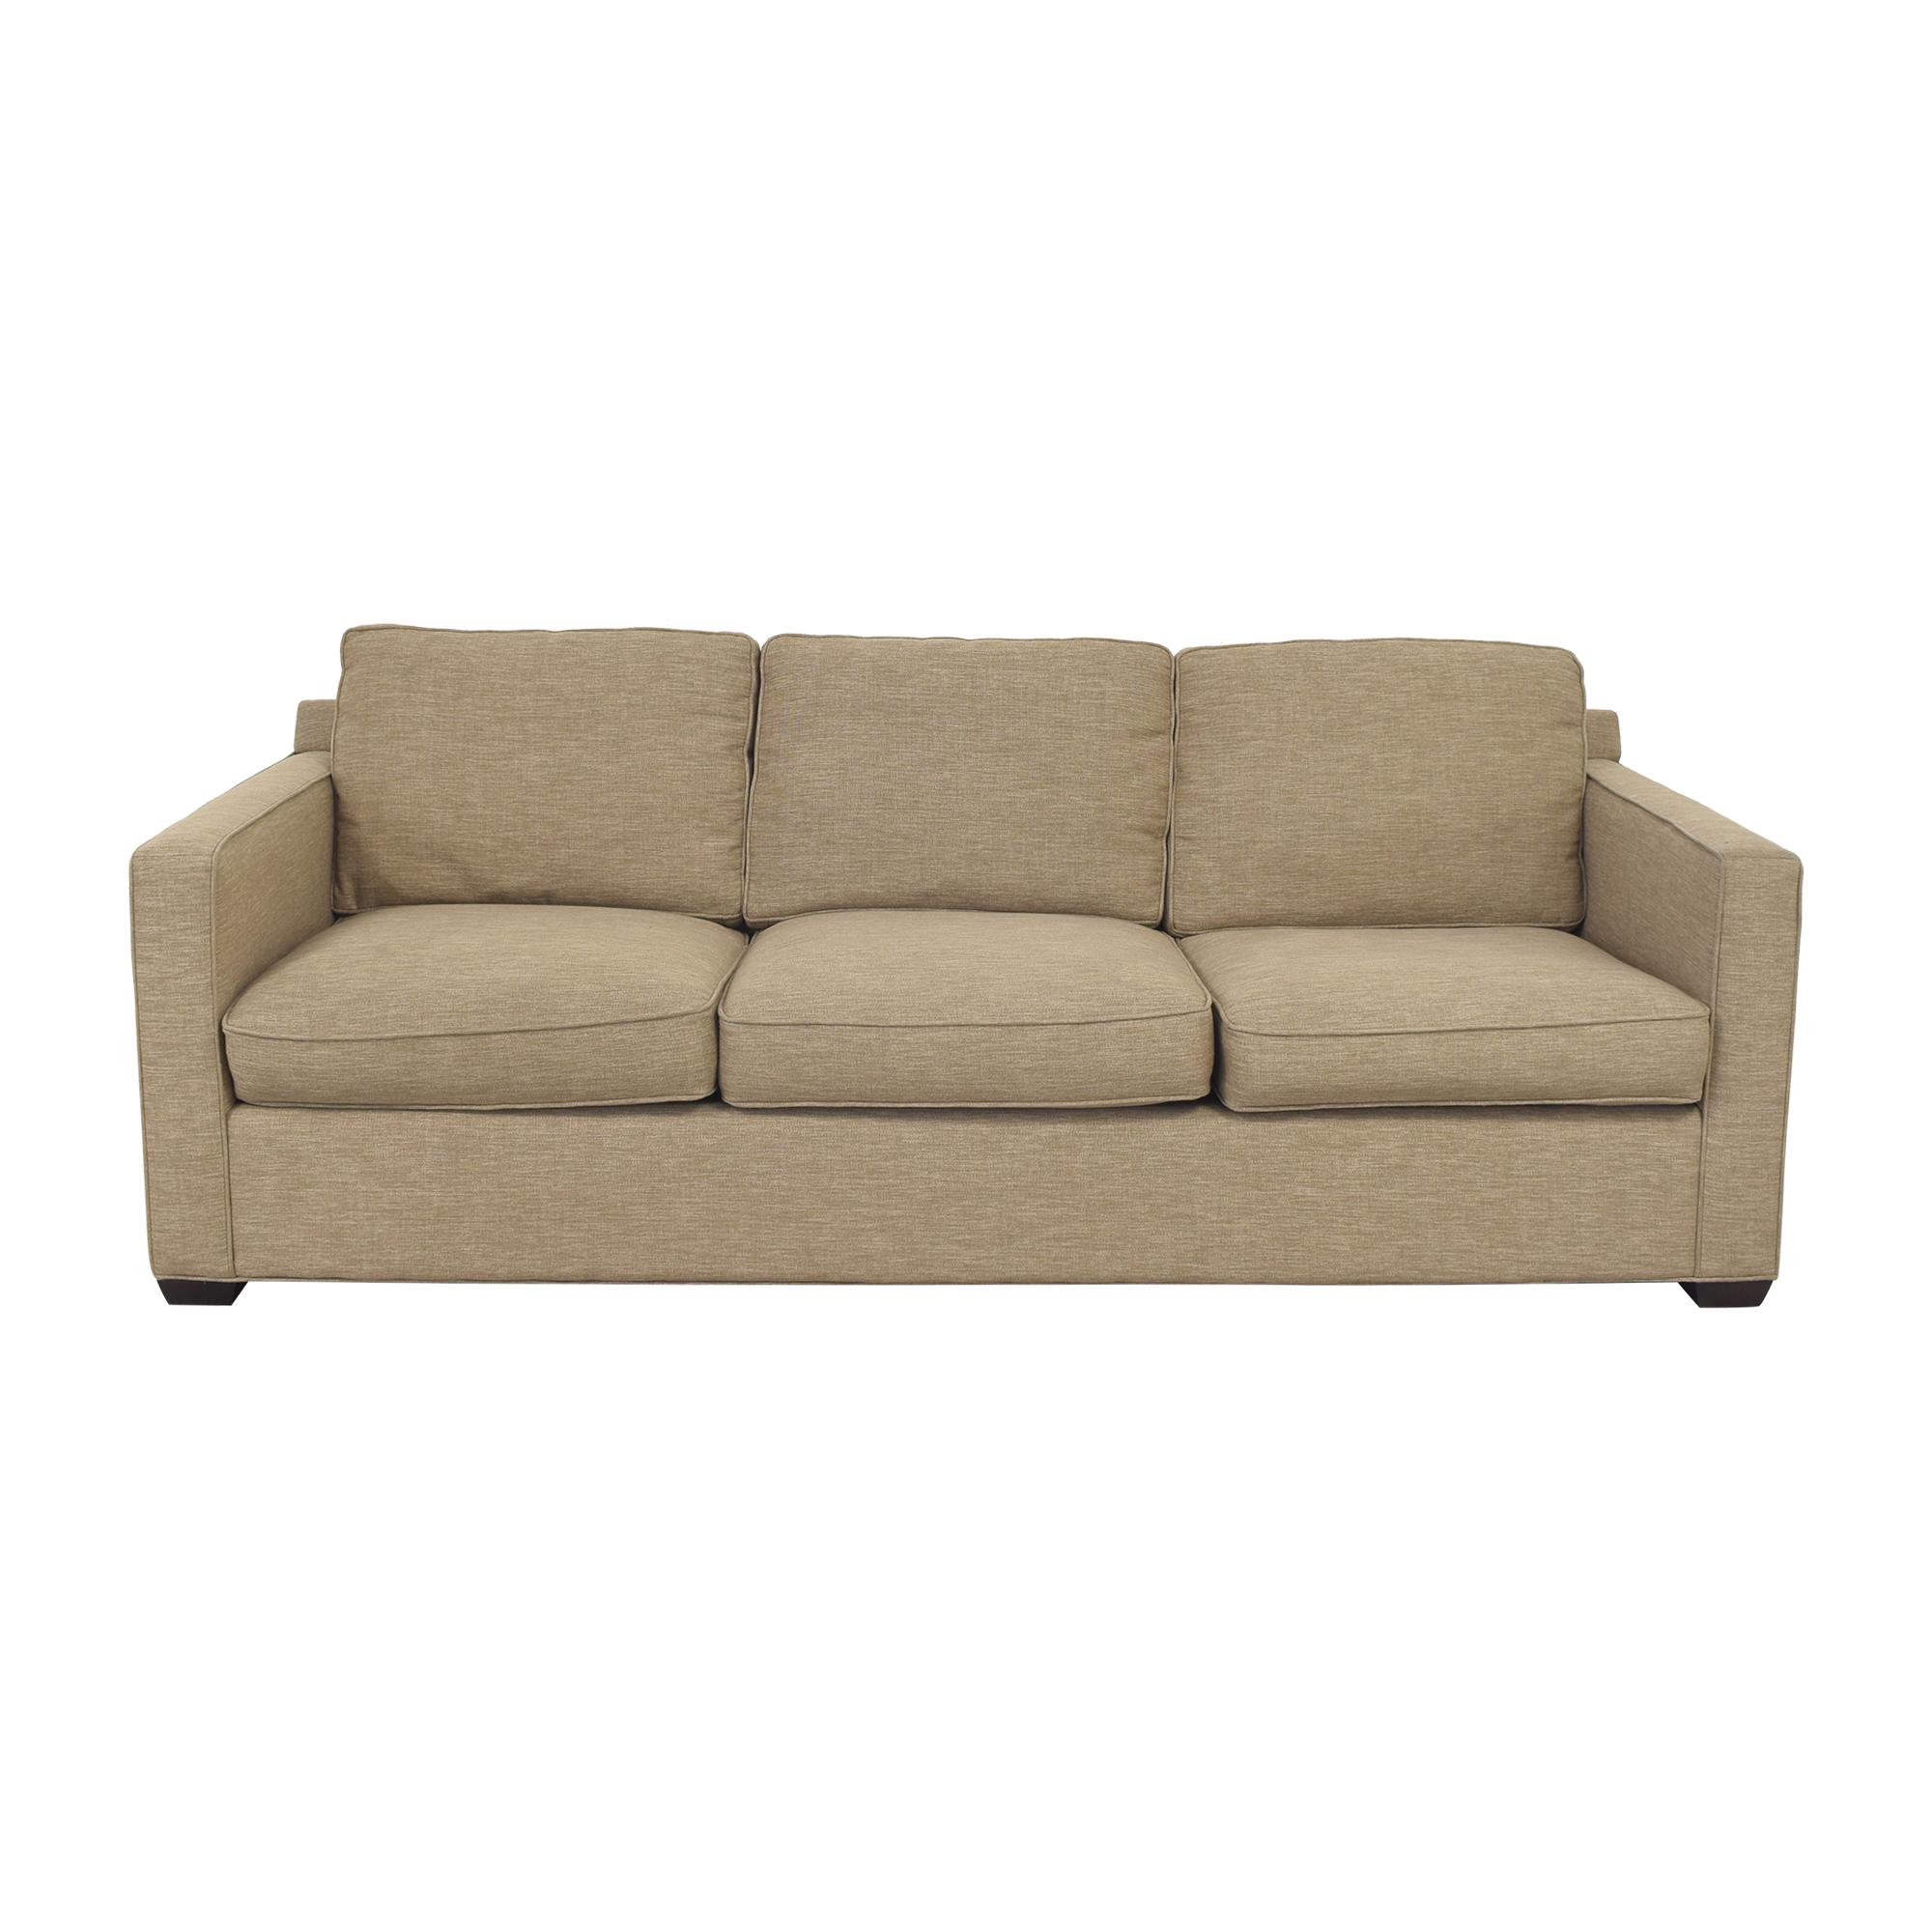 buy Crate & Barrel Crate & Barrel Davis 3 Seat Sofa online